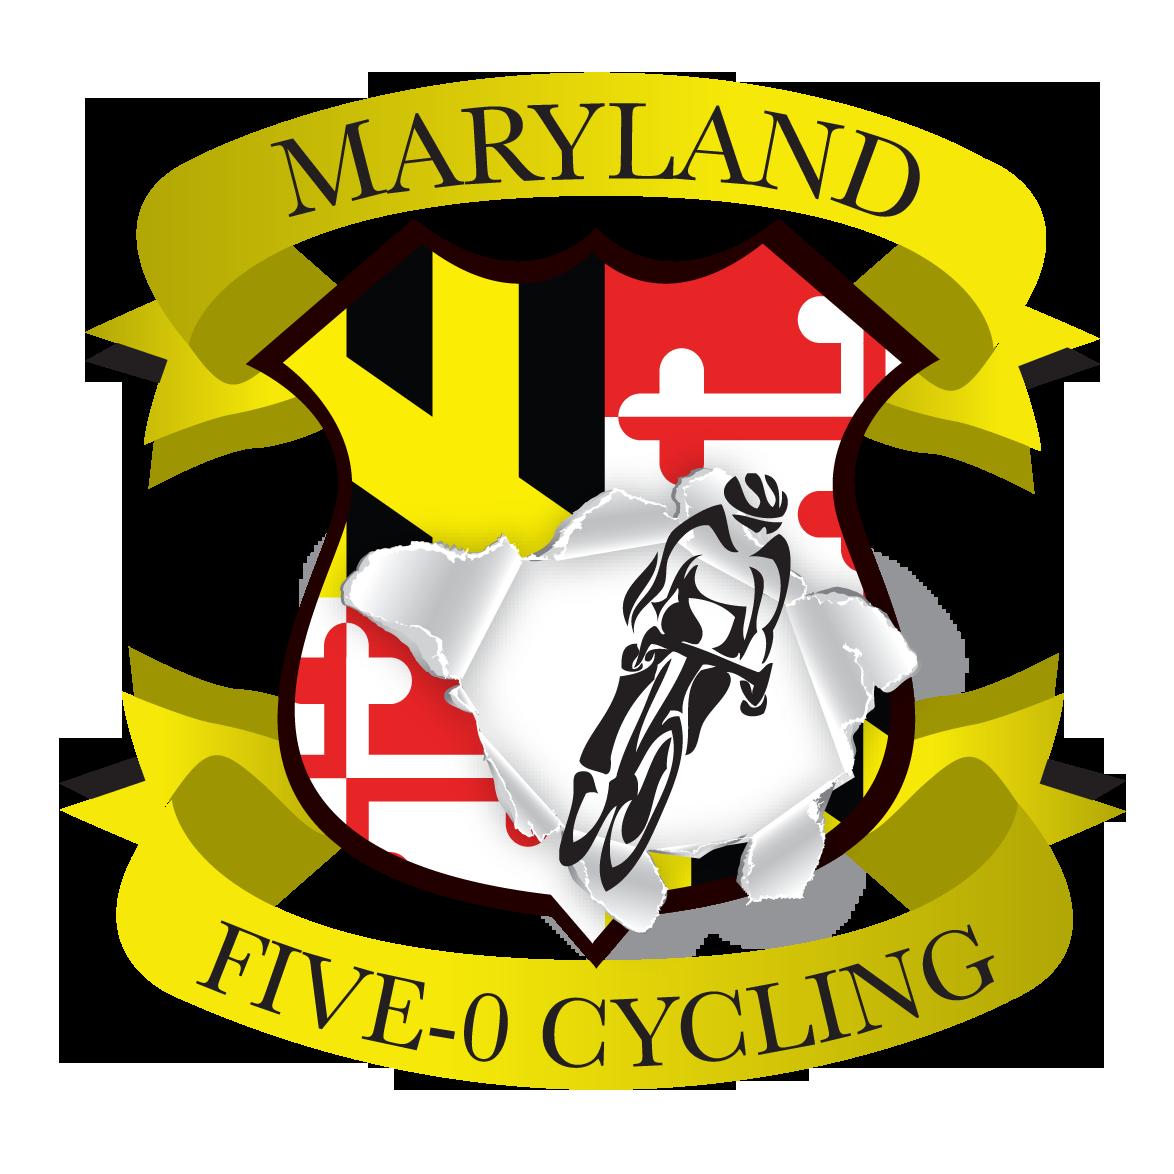 Maryland Five-0 Cycling, Inc.